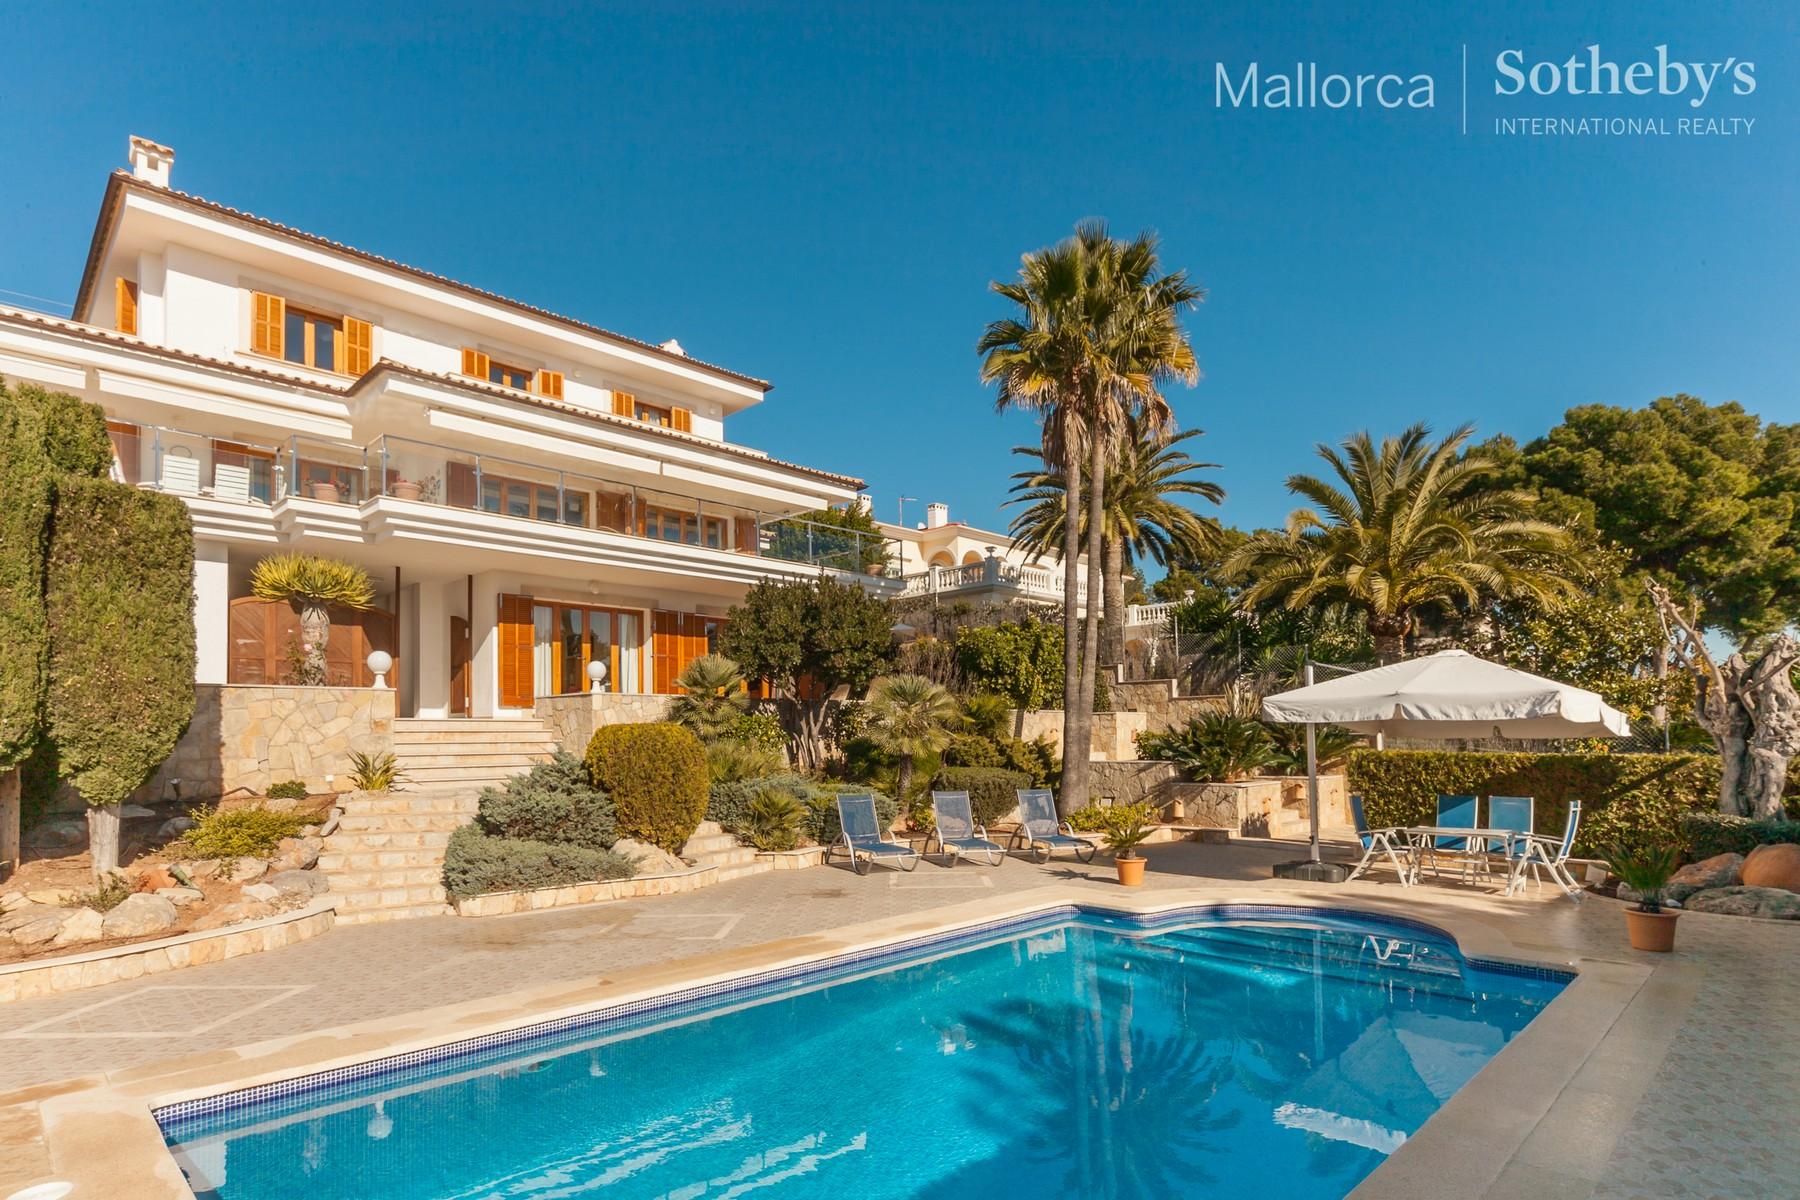 Single Family Home for Sale at Villa with sea views in Bendinat Palma De Mallorca, Balearic Islands 07157 Spain